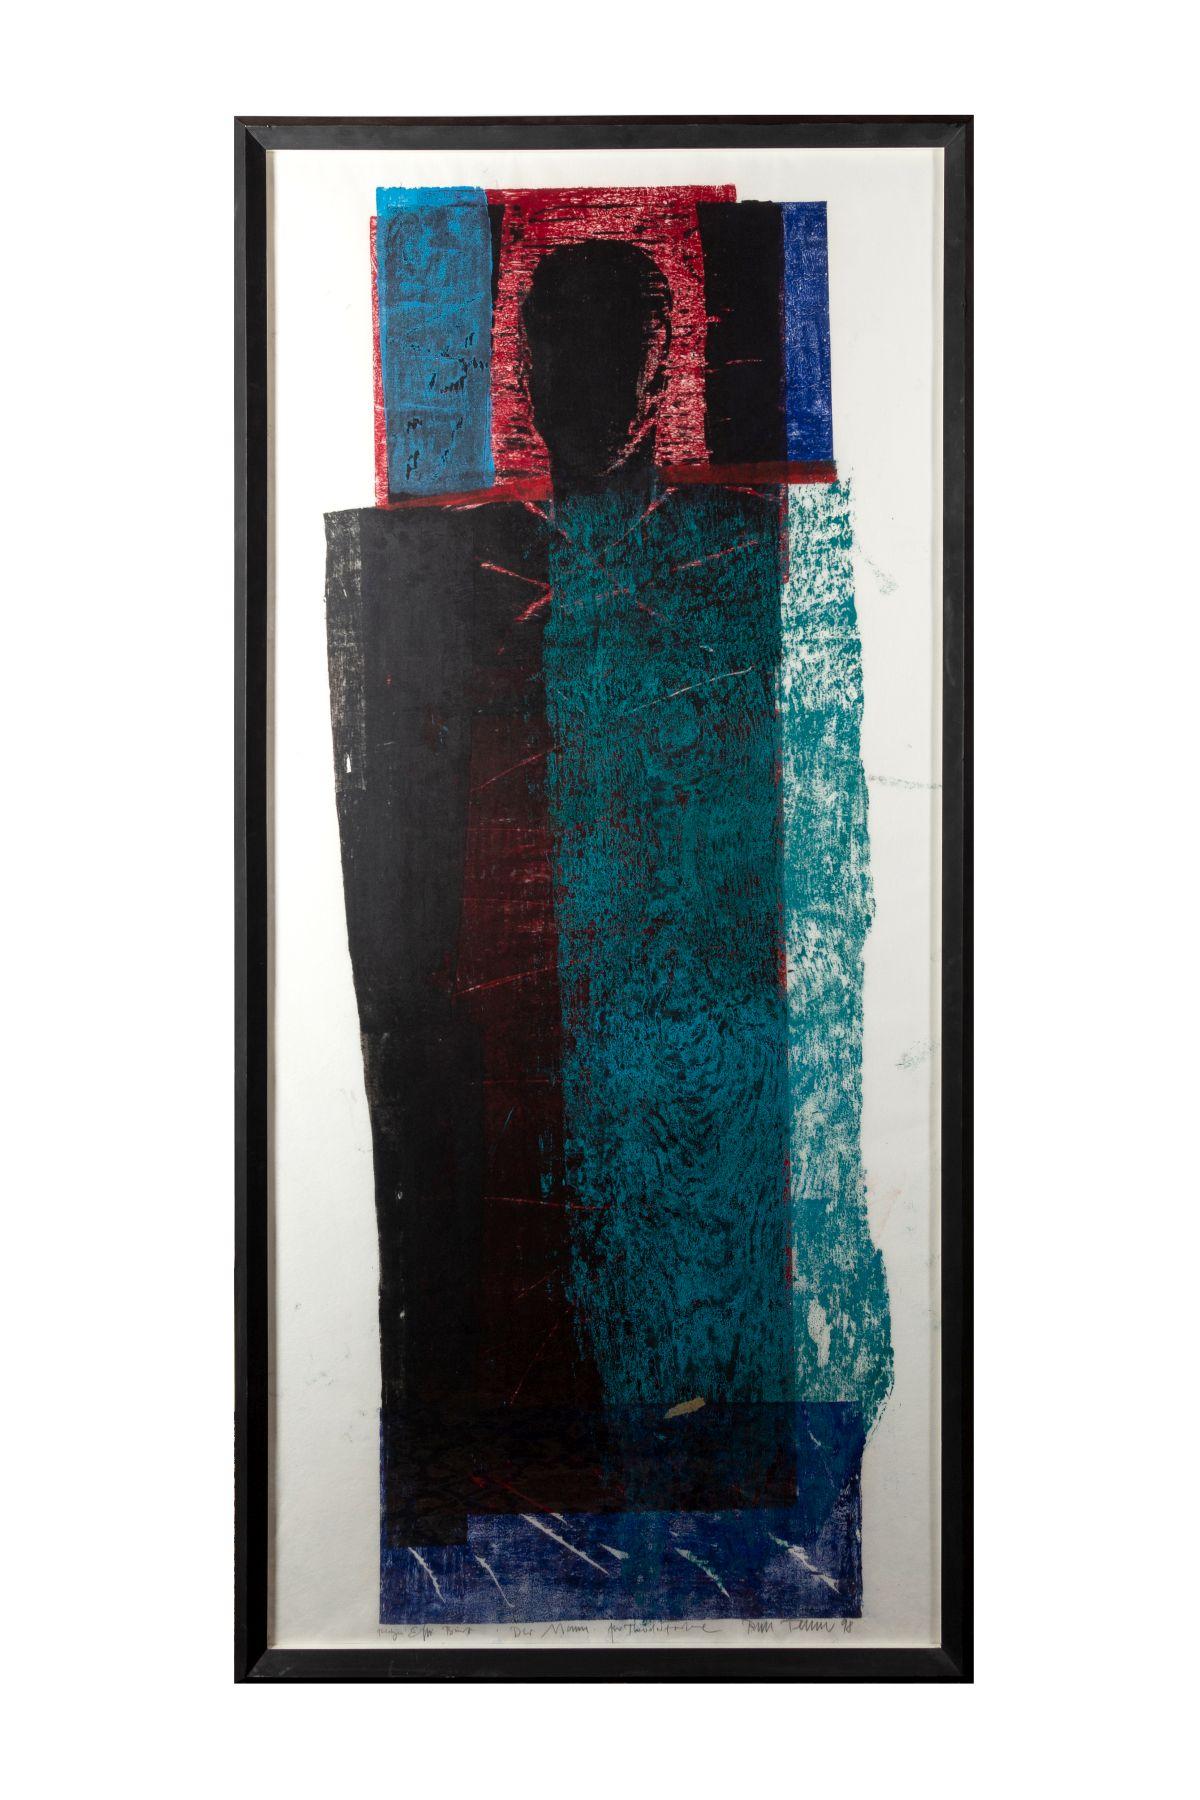 "#144 Ruth Tesmar, ""Effi Briest, The Man"", 1998 | Ruth Tesmar(* 8. April 1951 in Potsdam) ,"" Effi Briest. Der Mann"", 1998 Image"